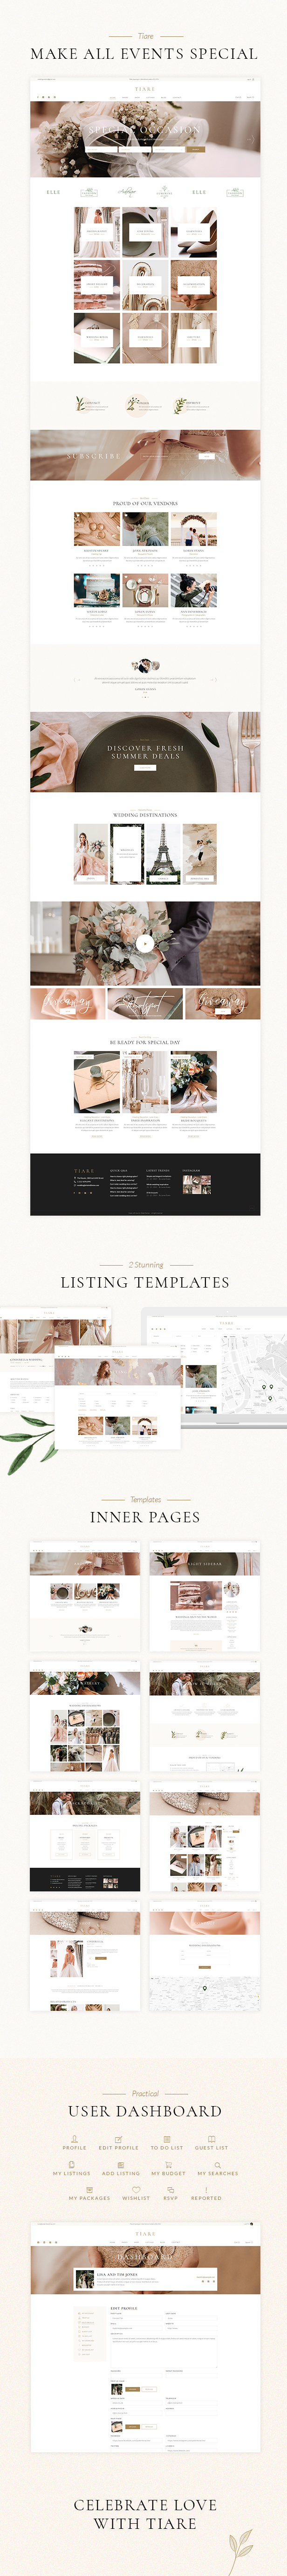 Tiare - Wedding Vendor Directory Theme - 2